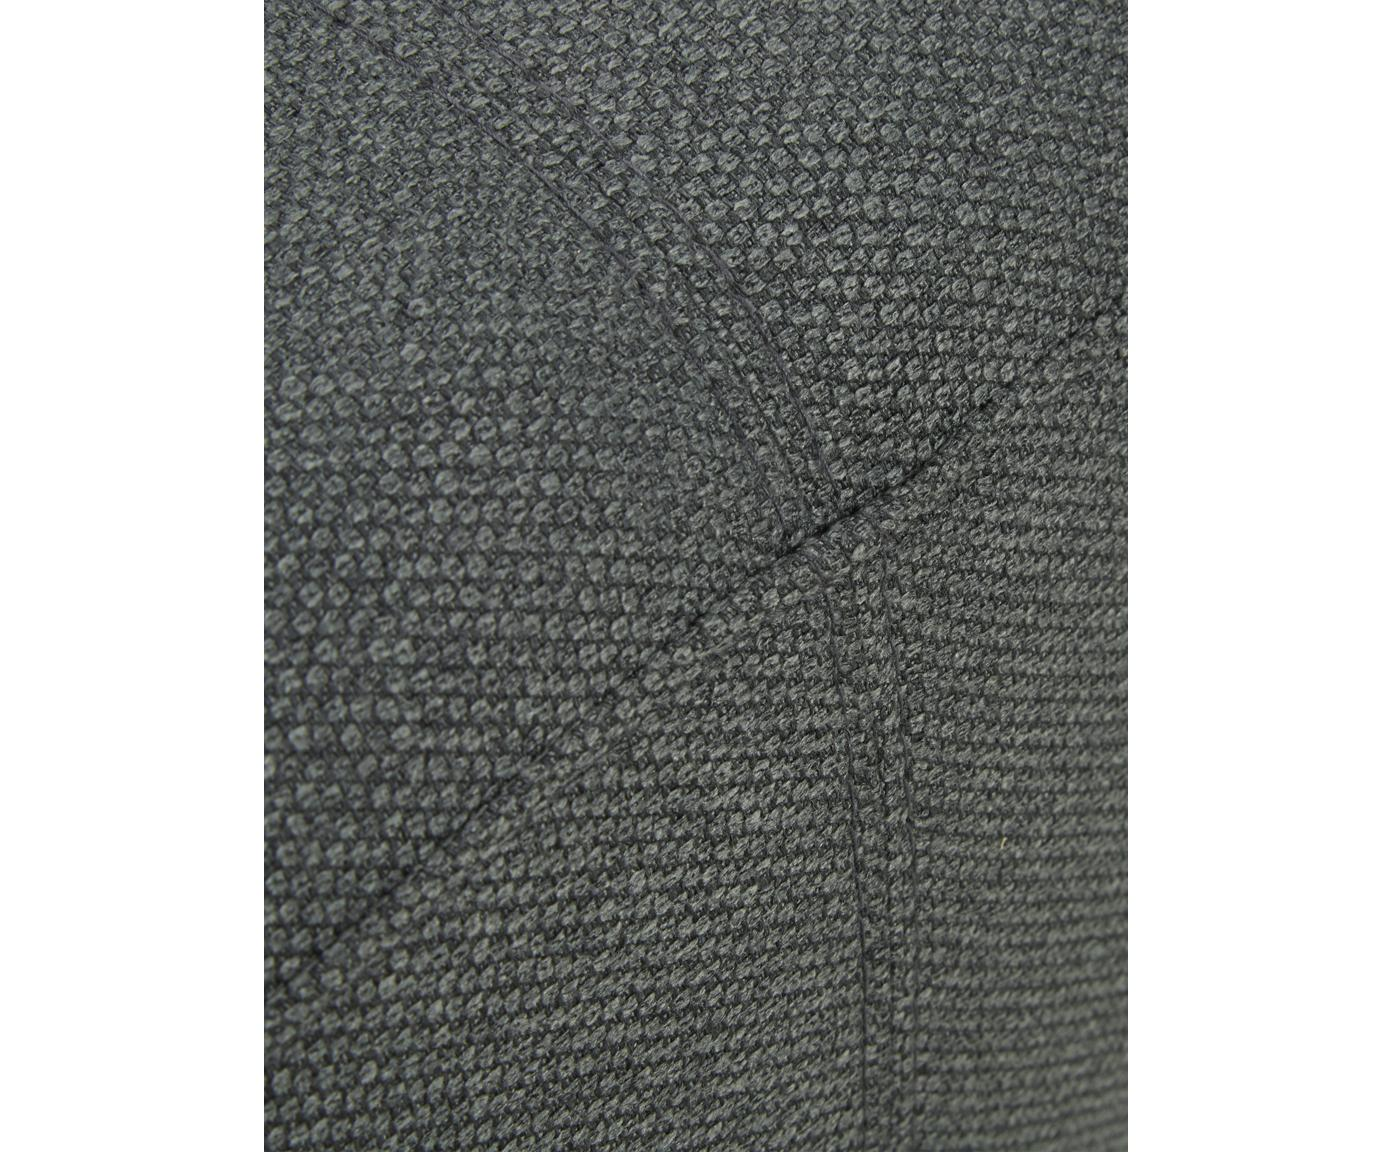 Ecksofa Ramira, Bezug: Polyester 20.000 Scheuert, Gestell: Massives Kiefernholz, Spe, Füße: Metall, pulverbeschichtet, Webstoff Anthrazit, 192 x 79 cm